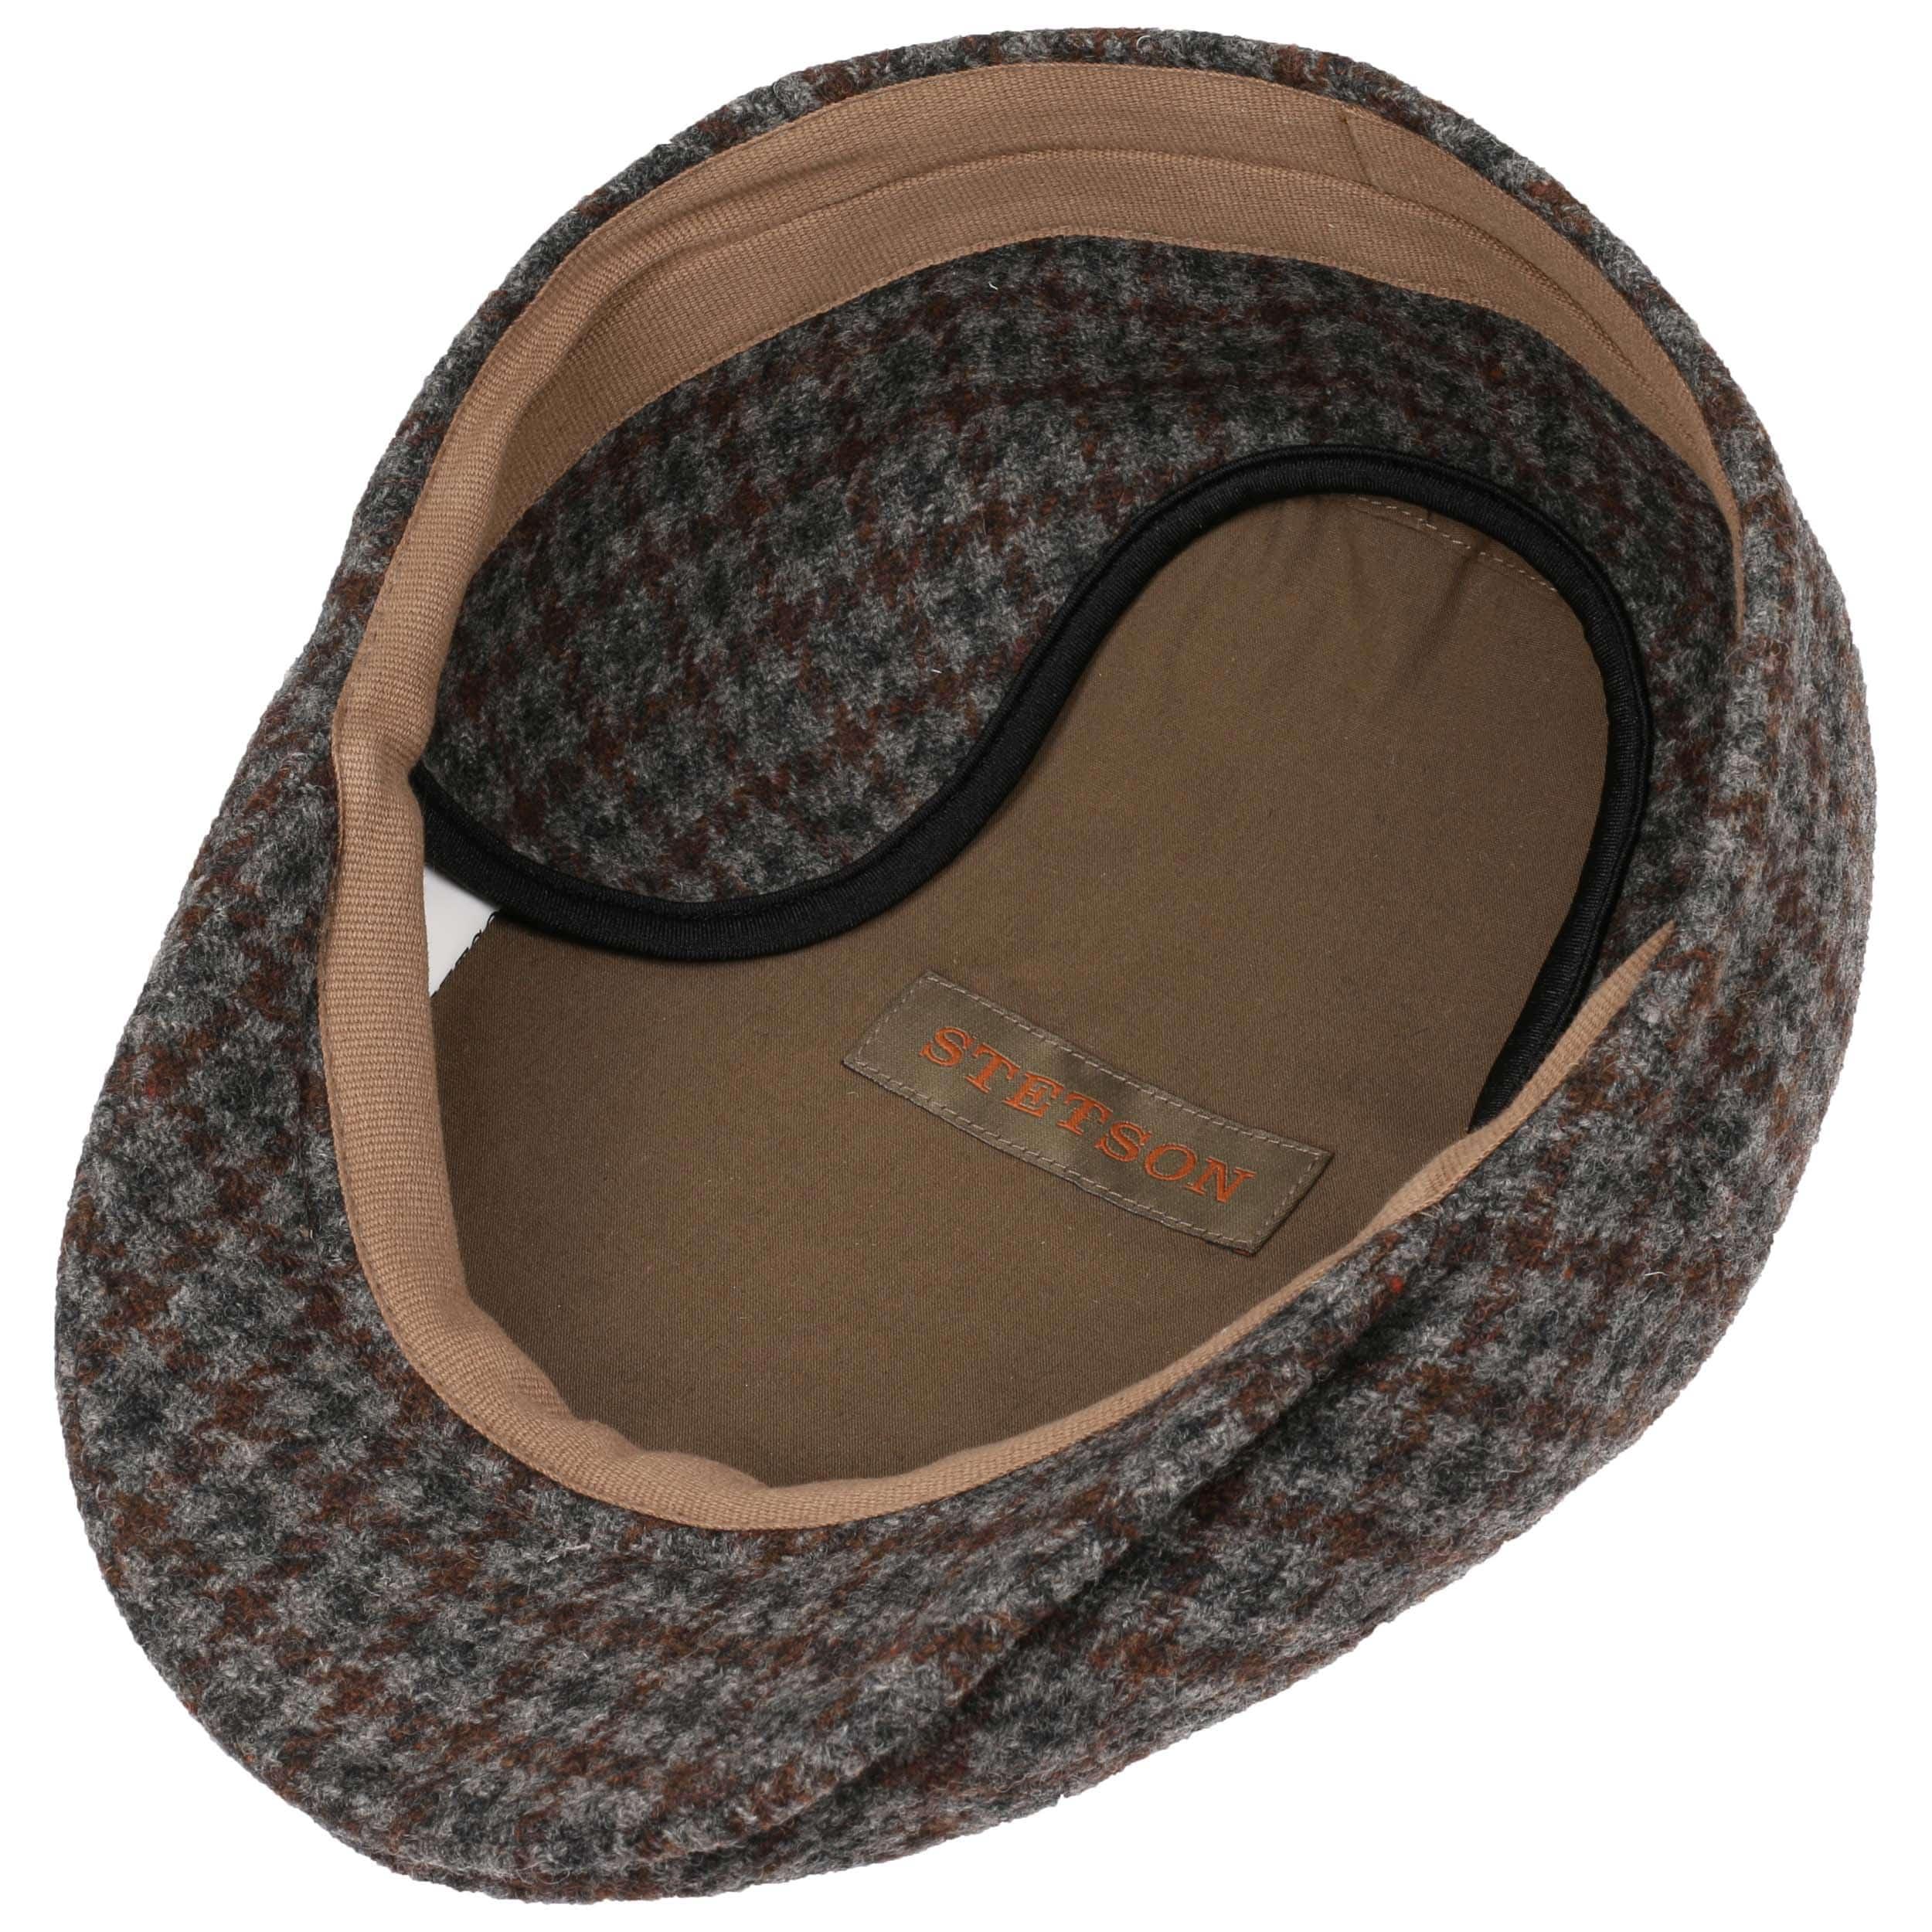 710f95e837144 ... Kent Wool Earflaps Flat Cap by Stetson - grey-brown 2 ...